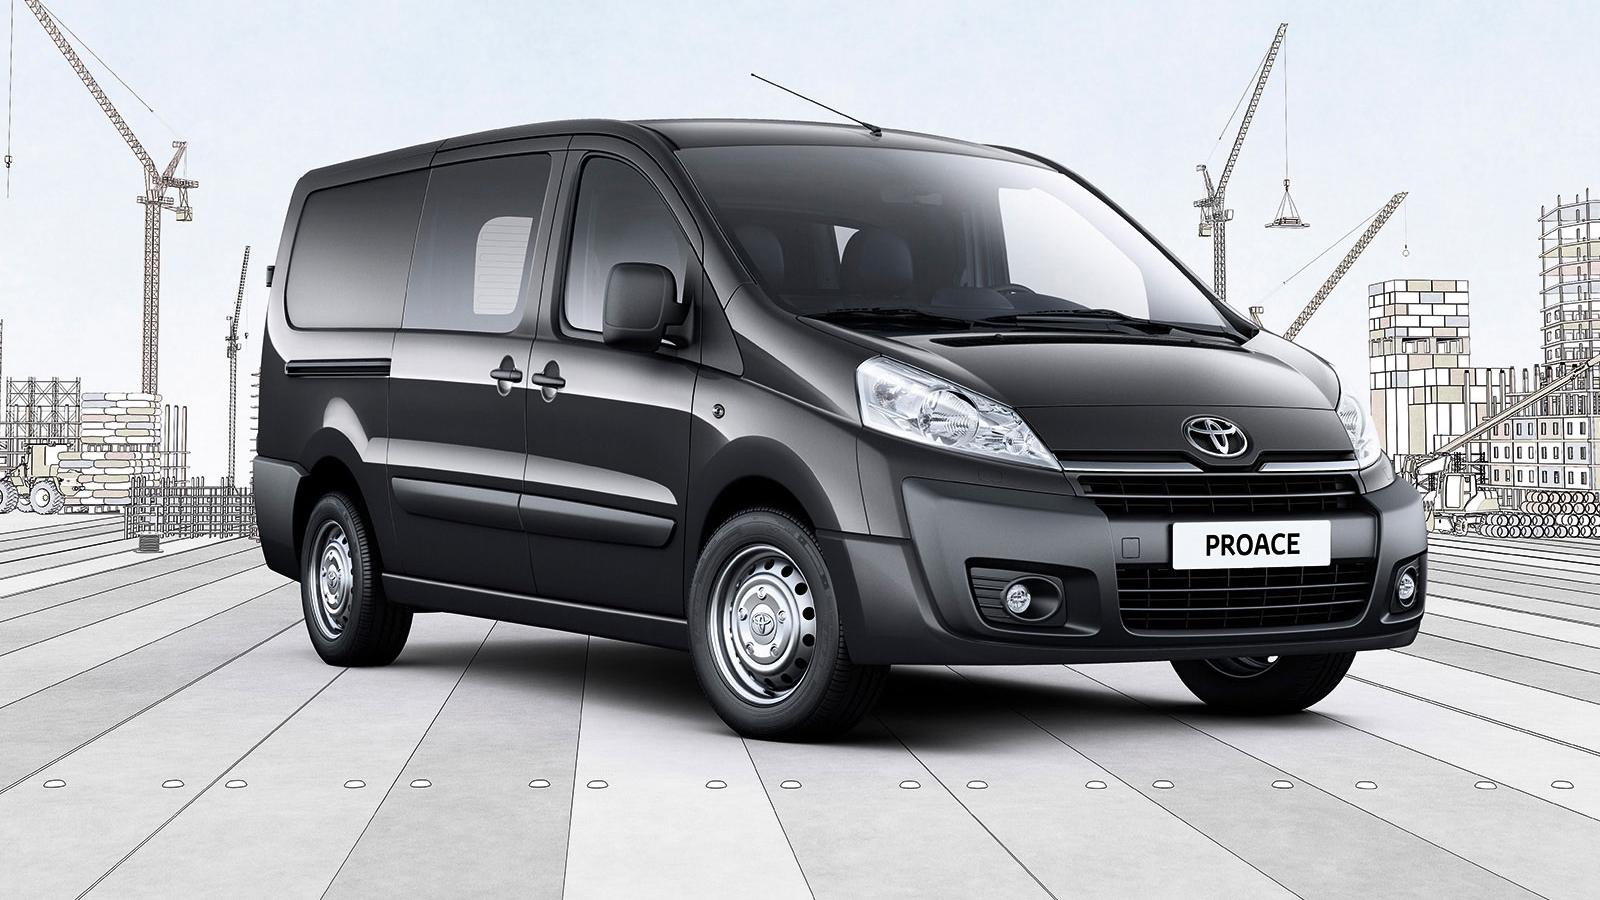 Toyota Proace Toyota Mons Concessionnaire Officiel